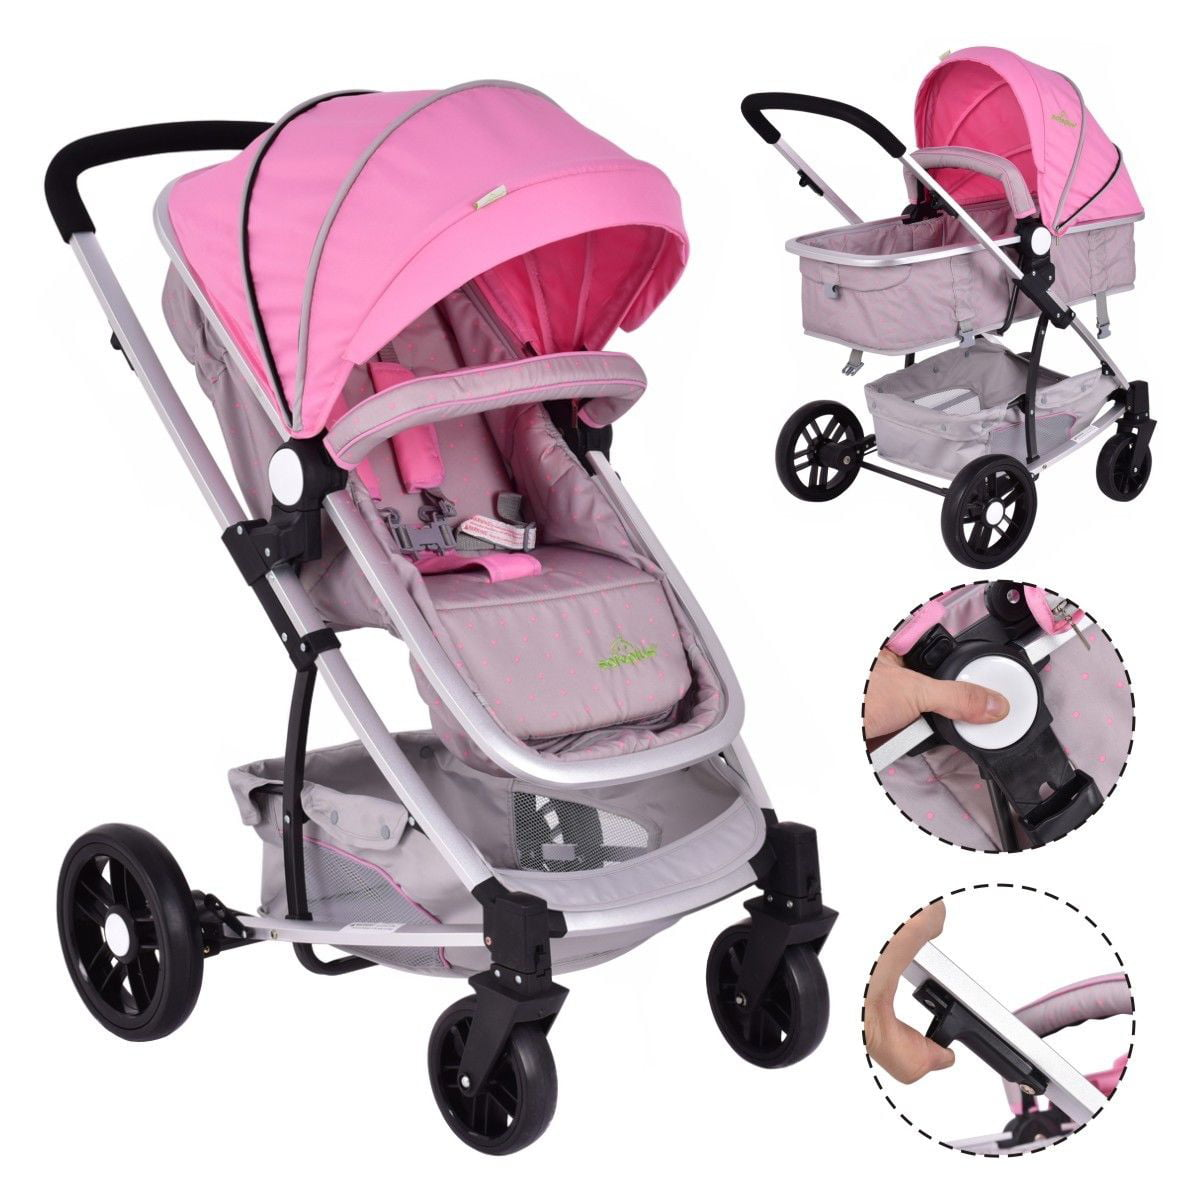 2 In1 Foldable Baby Stroller Kids Travel Newborn Infant Buggy Pushchair Pink - Walmart.com